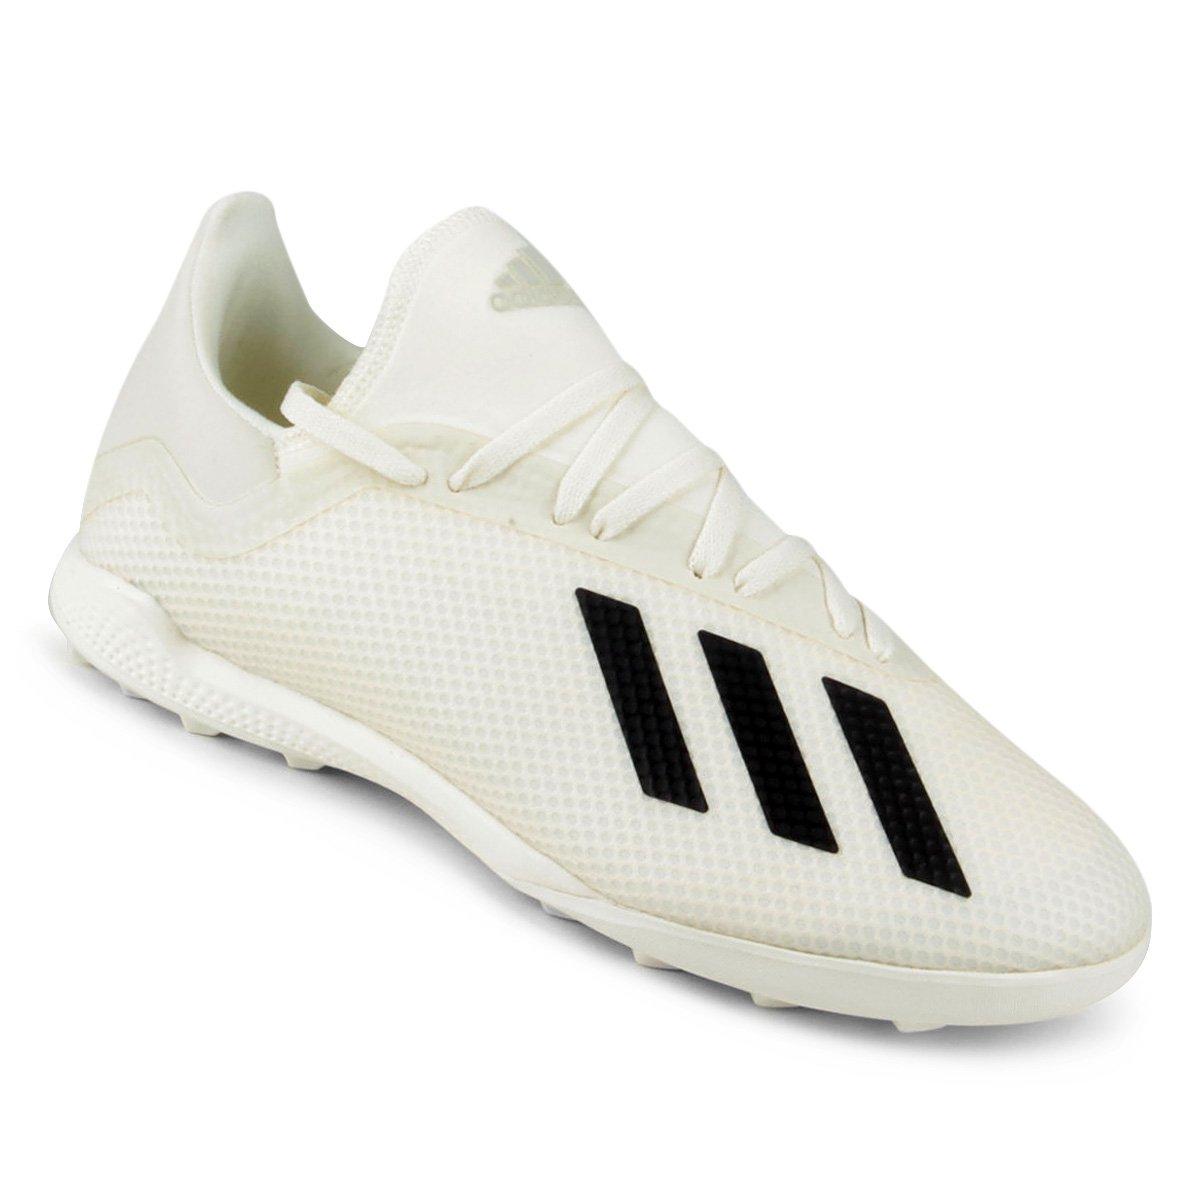 3117e965a6 Chuteira Society Adidas X Tango 18 3 TF